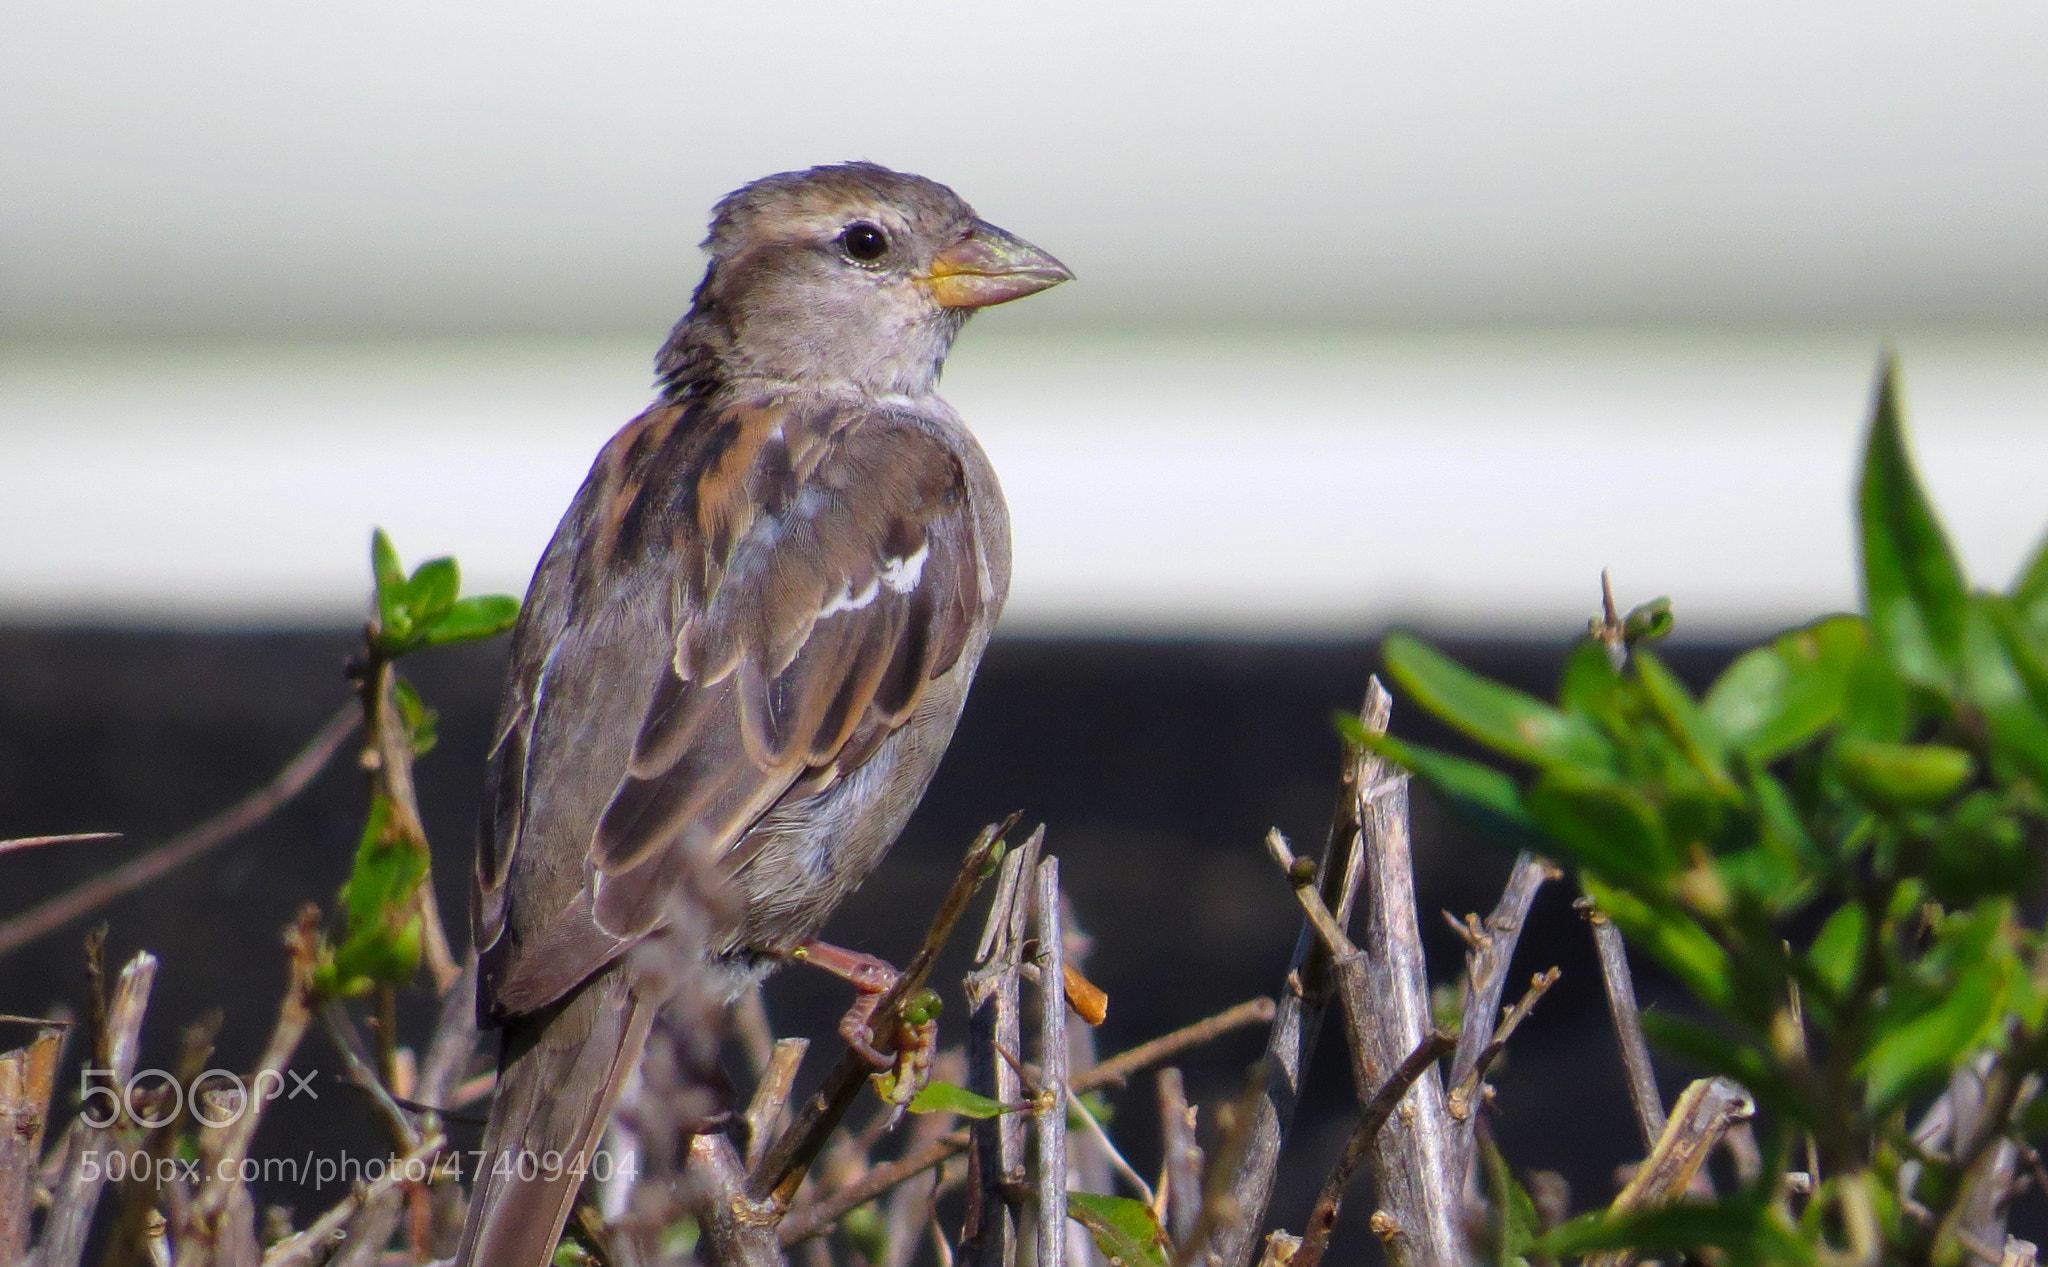 Photograph Bird by Sonny Kraack on 500px